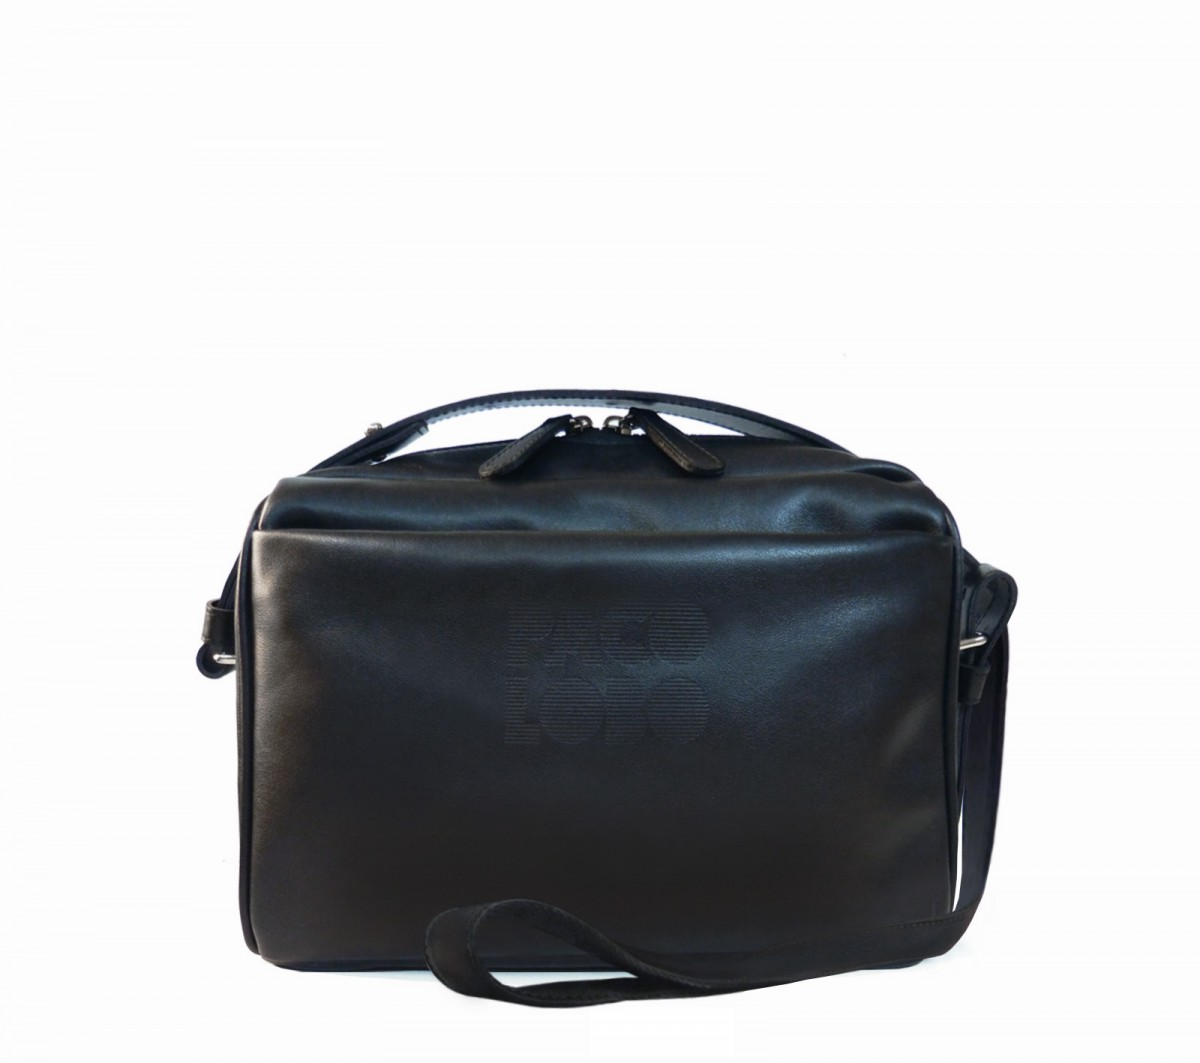 Urban bag with double handle